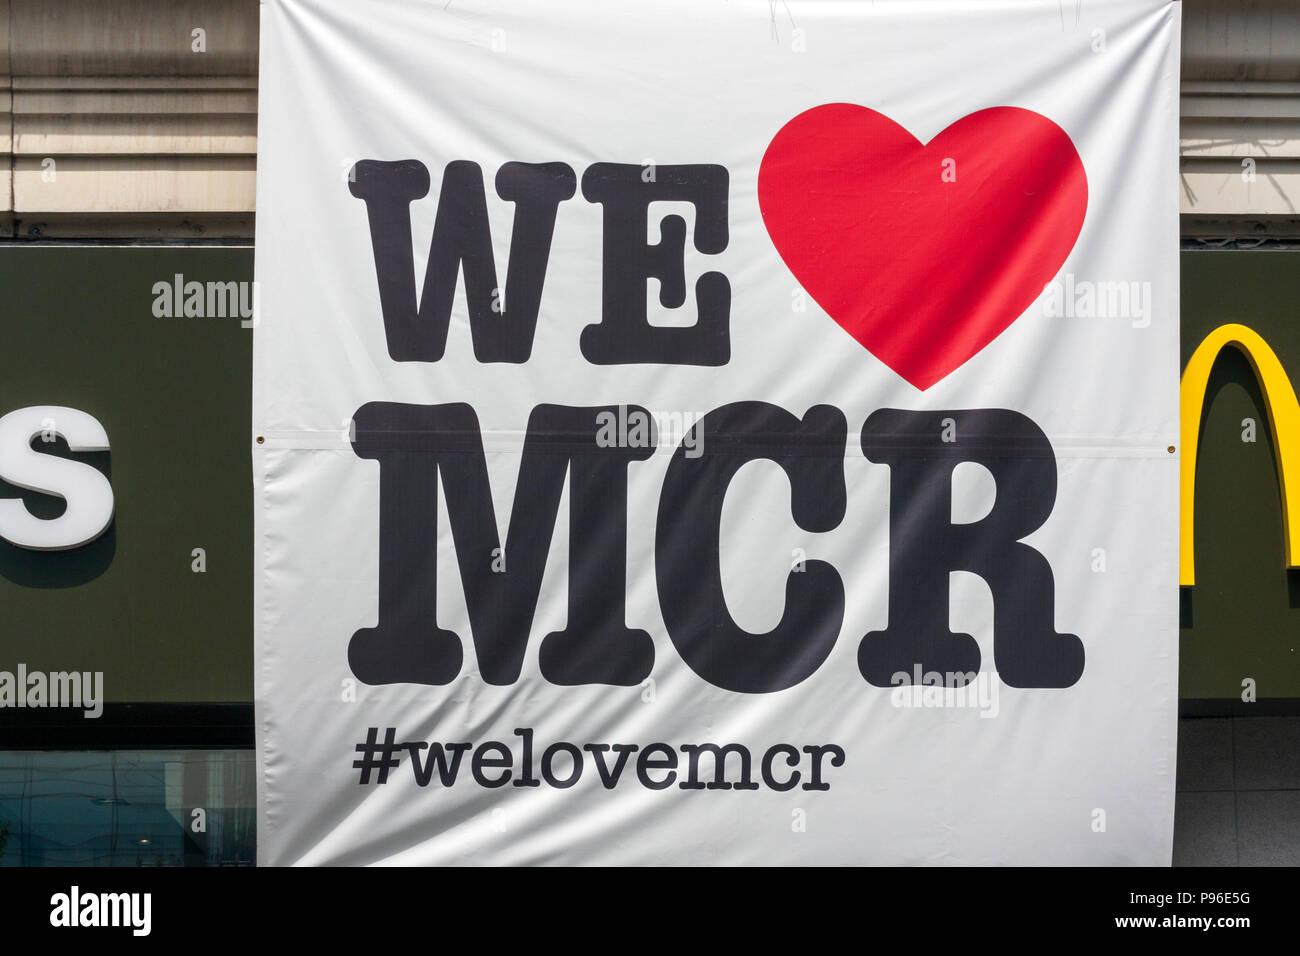 We Love MCR Banner - Stock Image